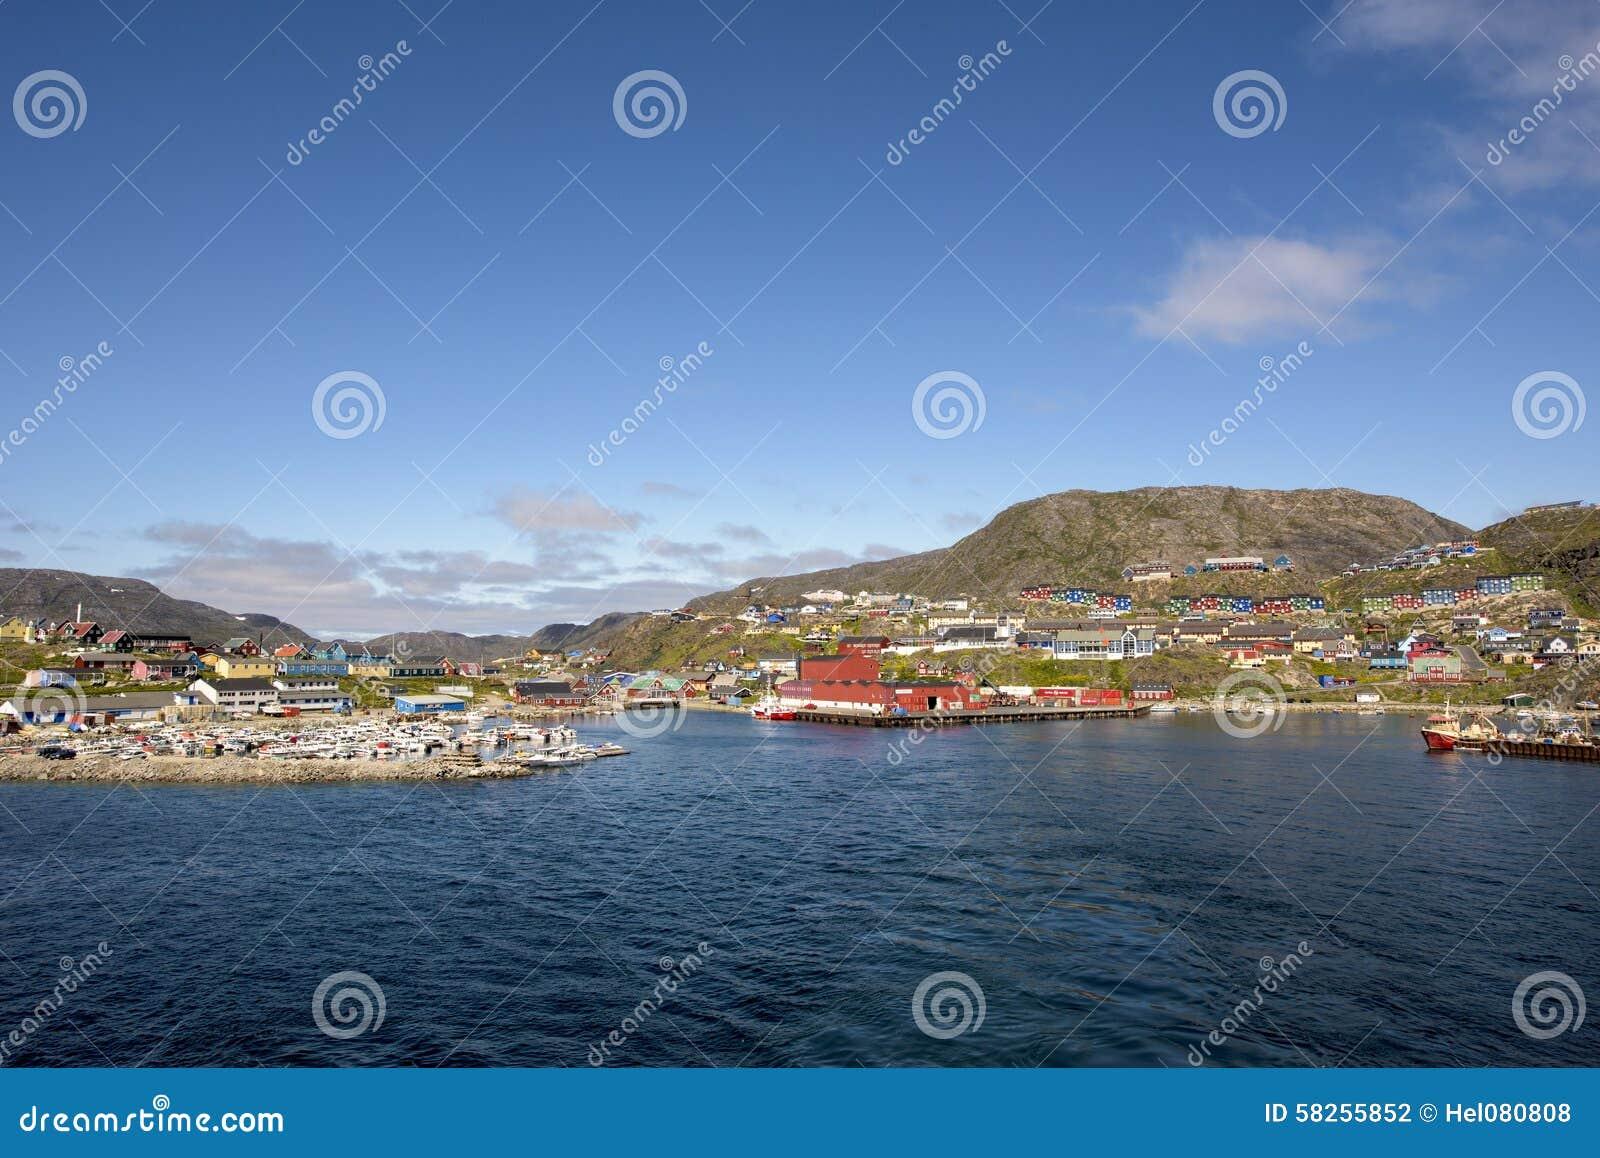 Qarqartoq, Groenland